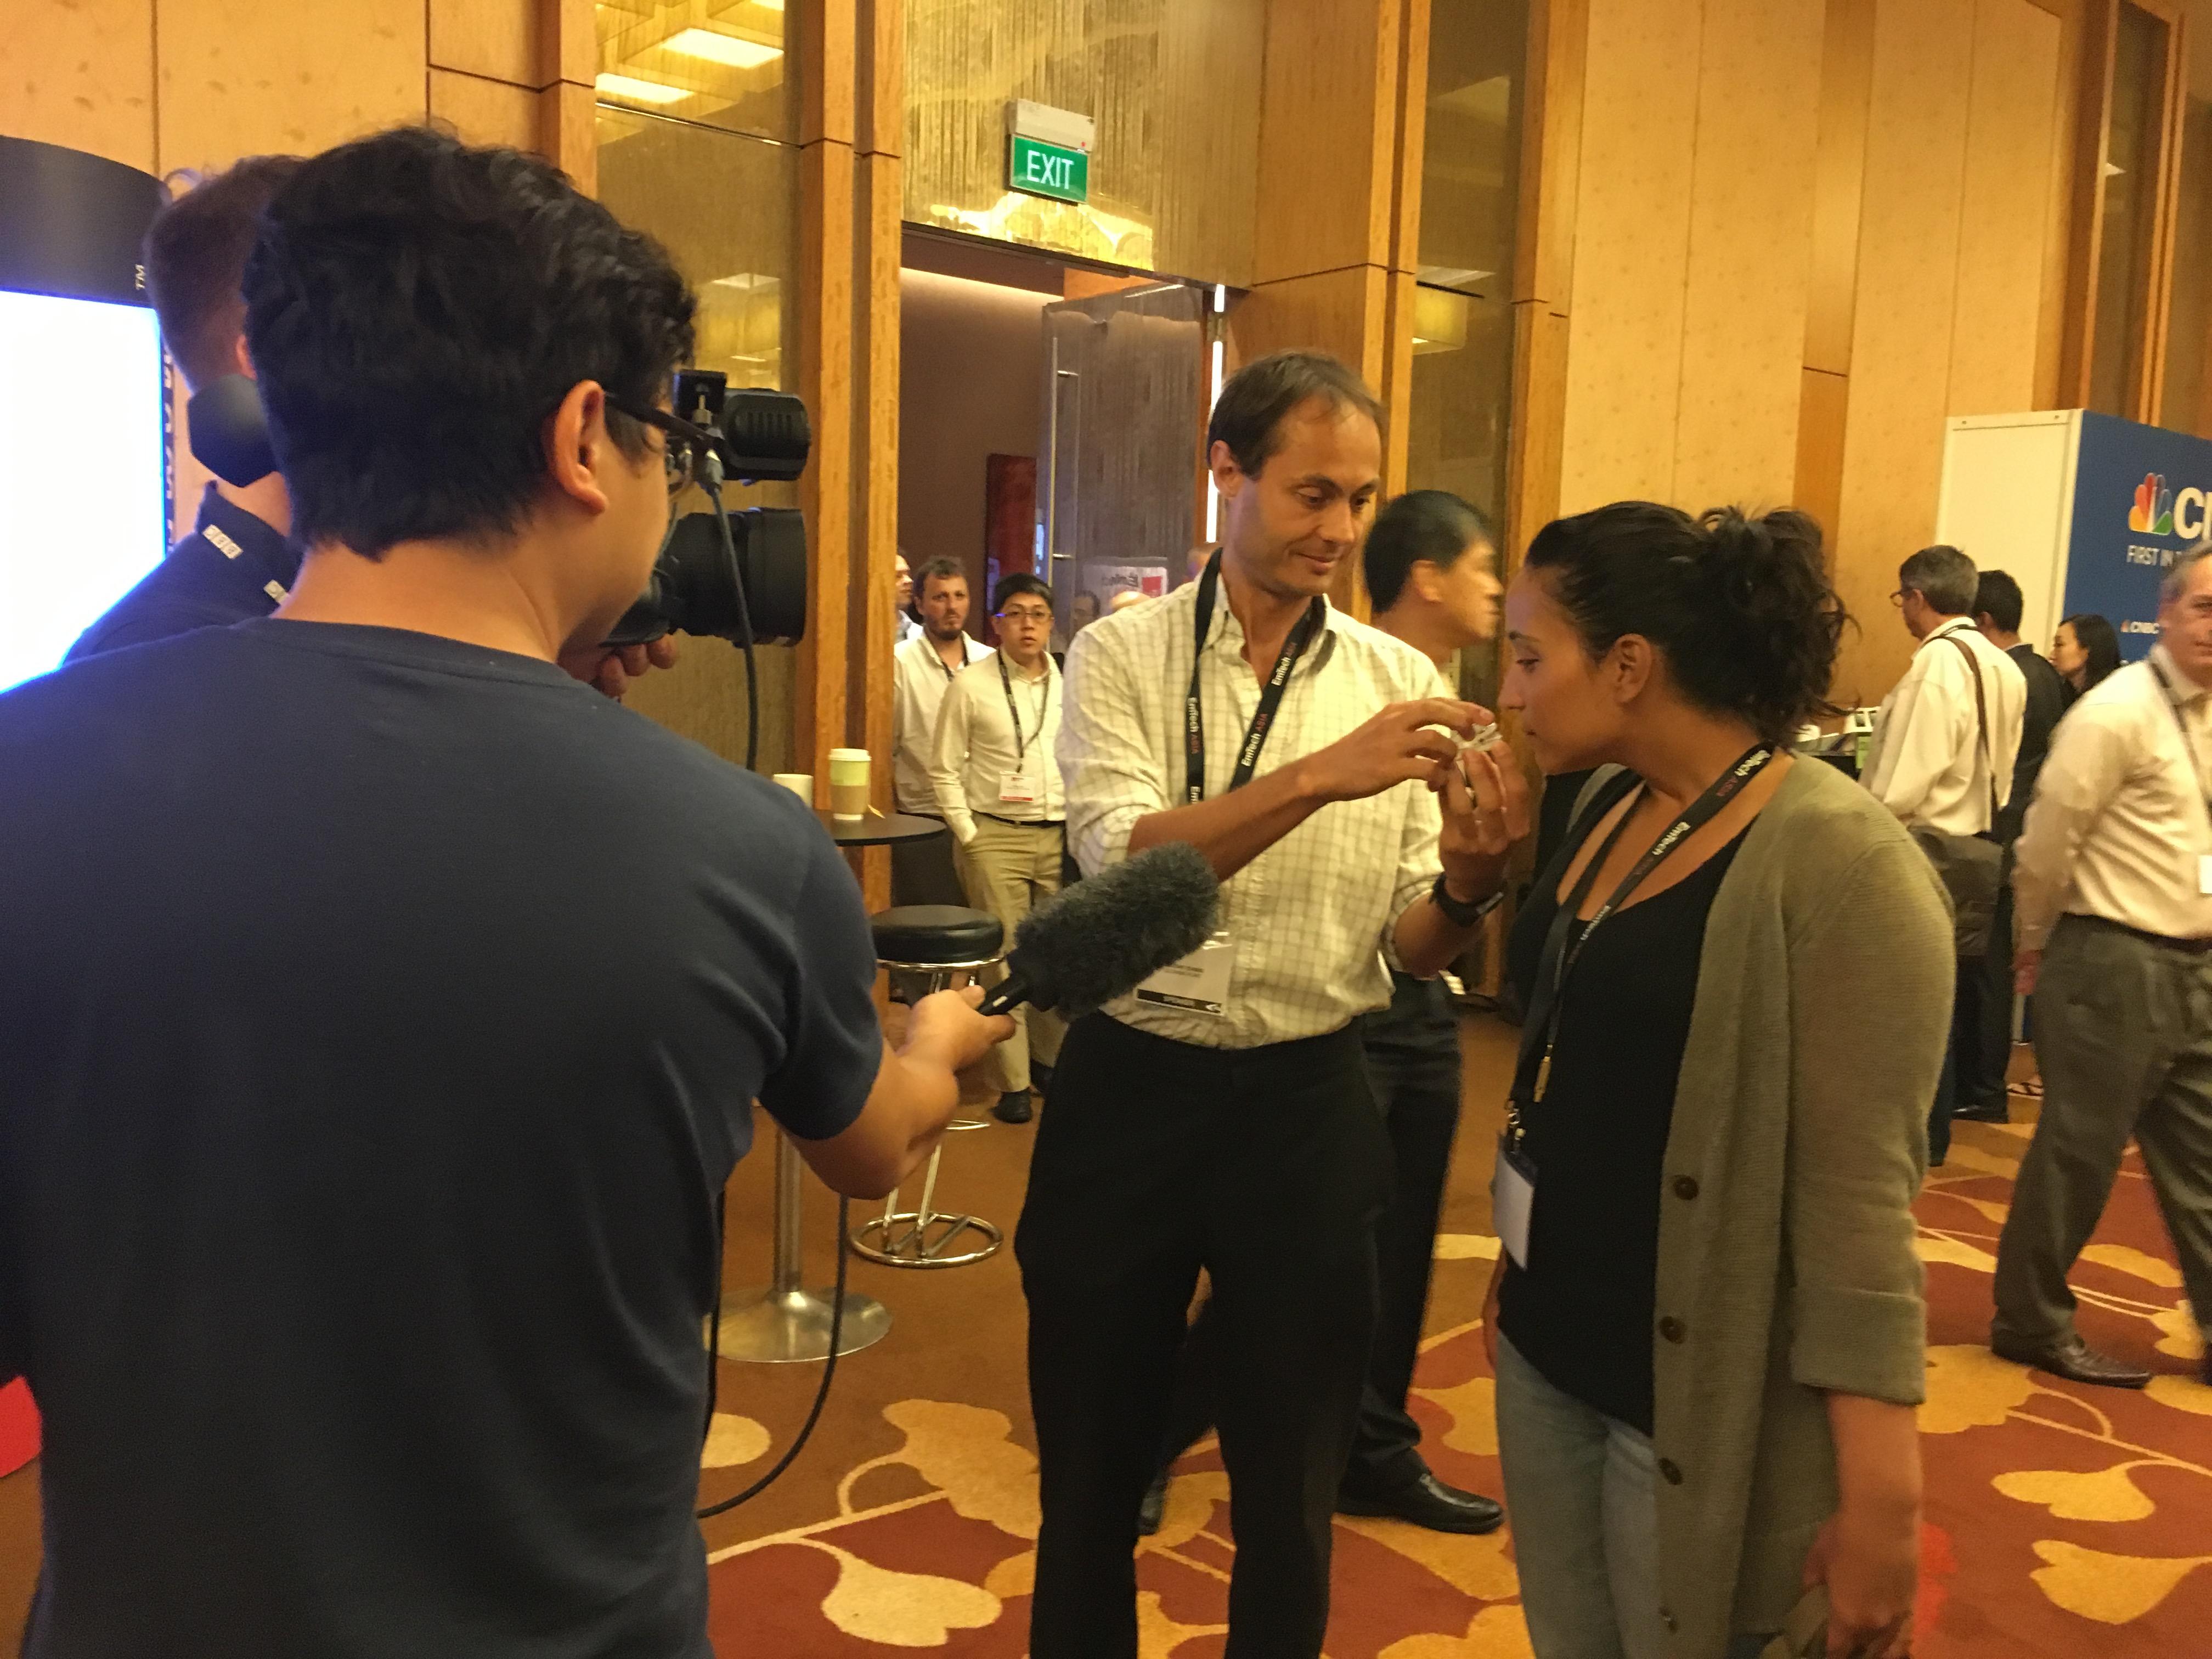 Antony Evans at EmTech Asia